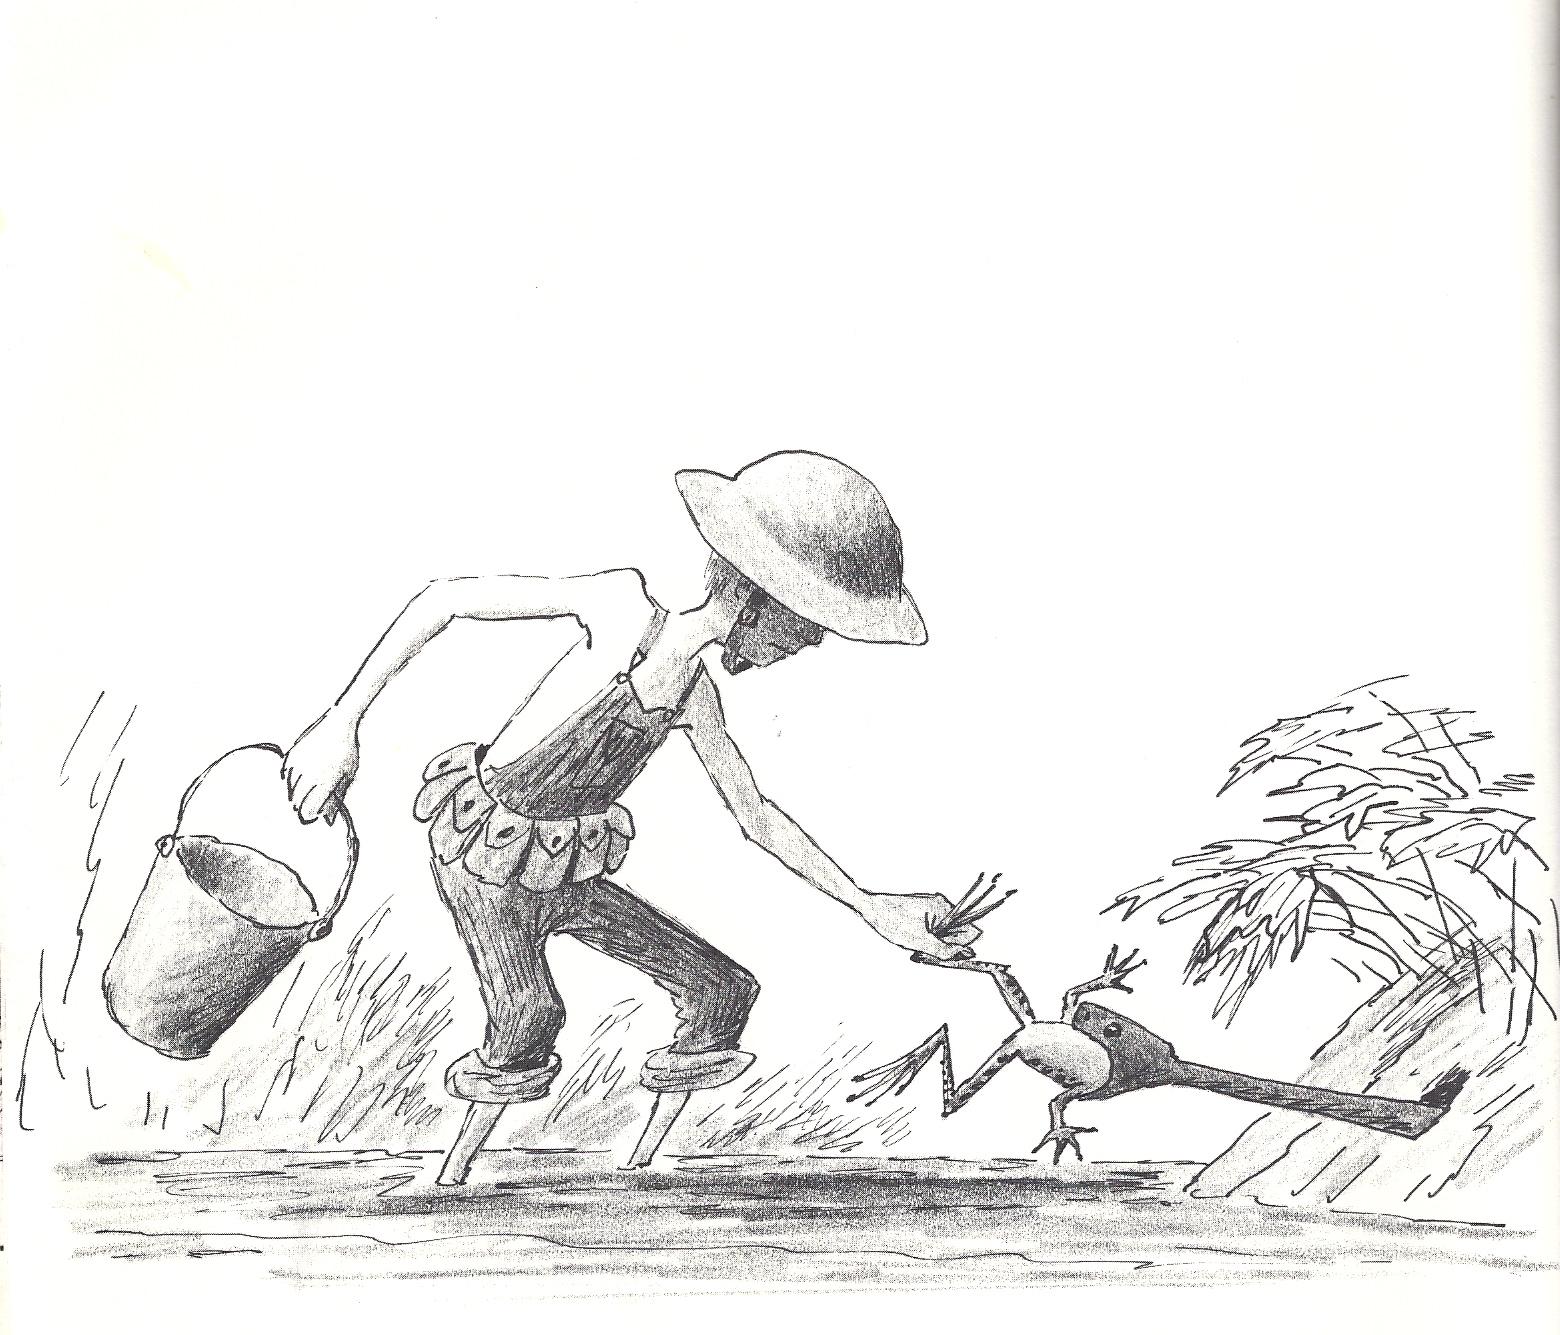 Nonnie's Blog: Bill Peet's Autobiography